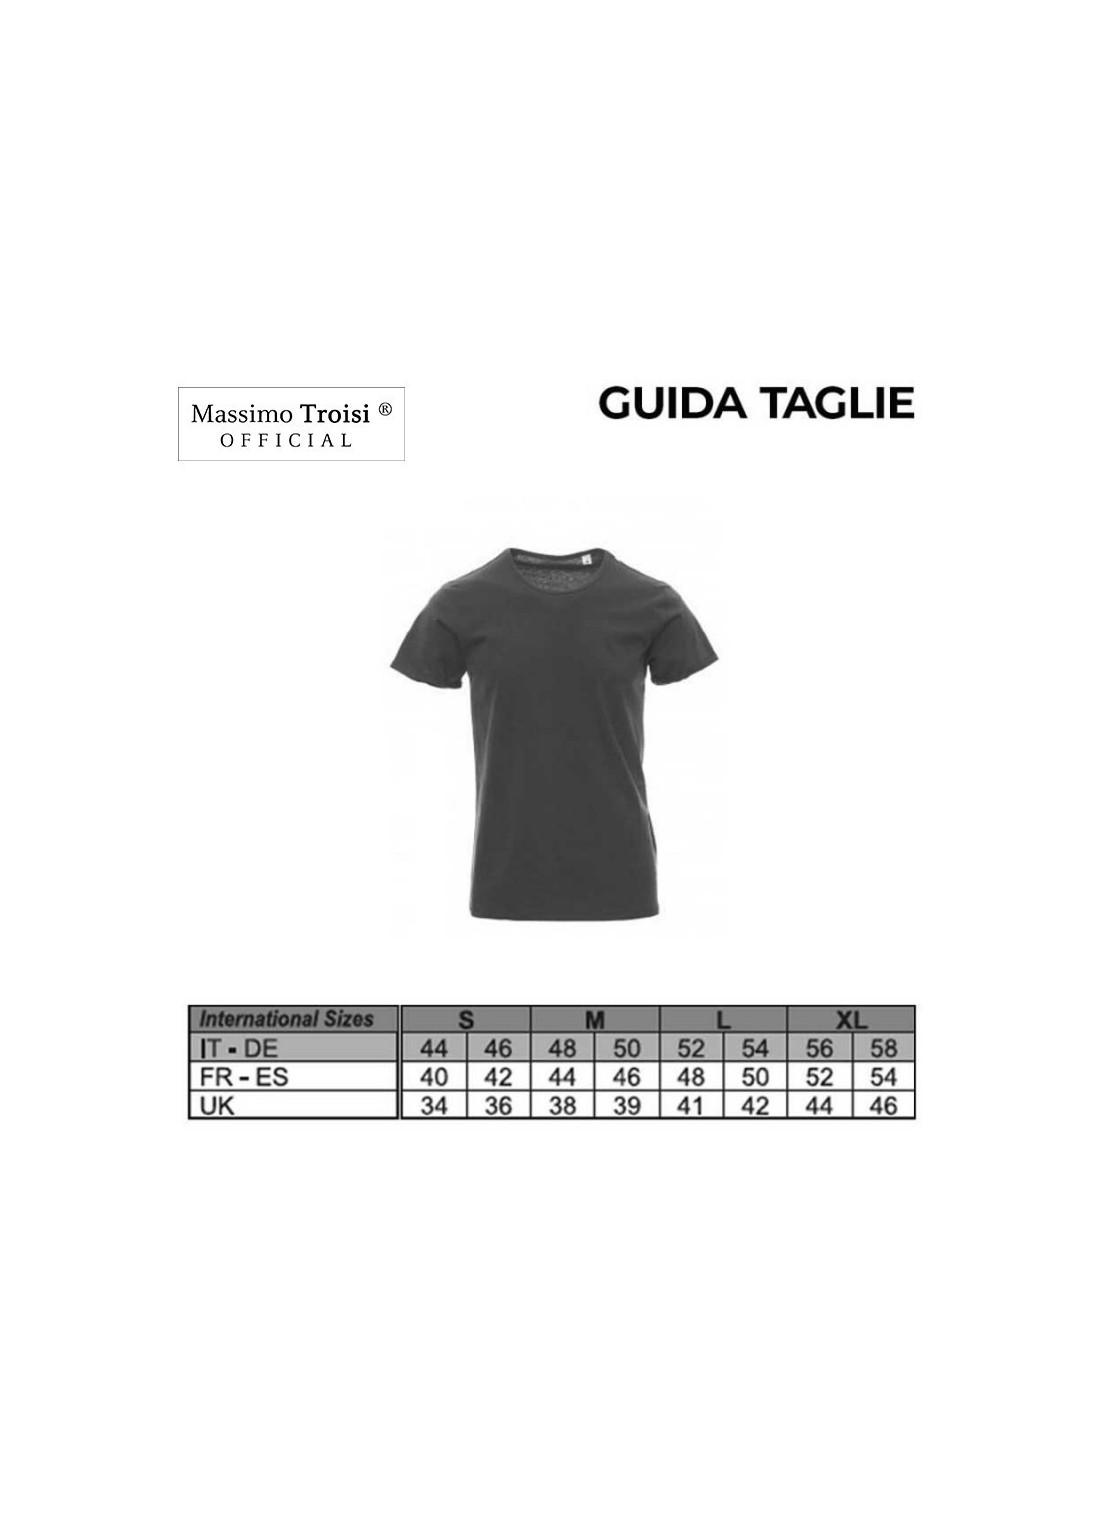 T-shirt SALUTO unisex nera